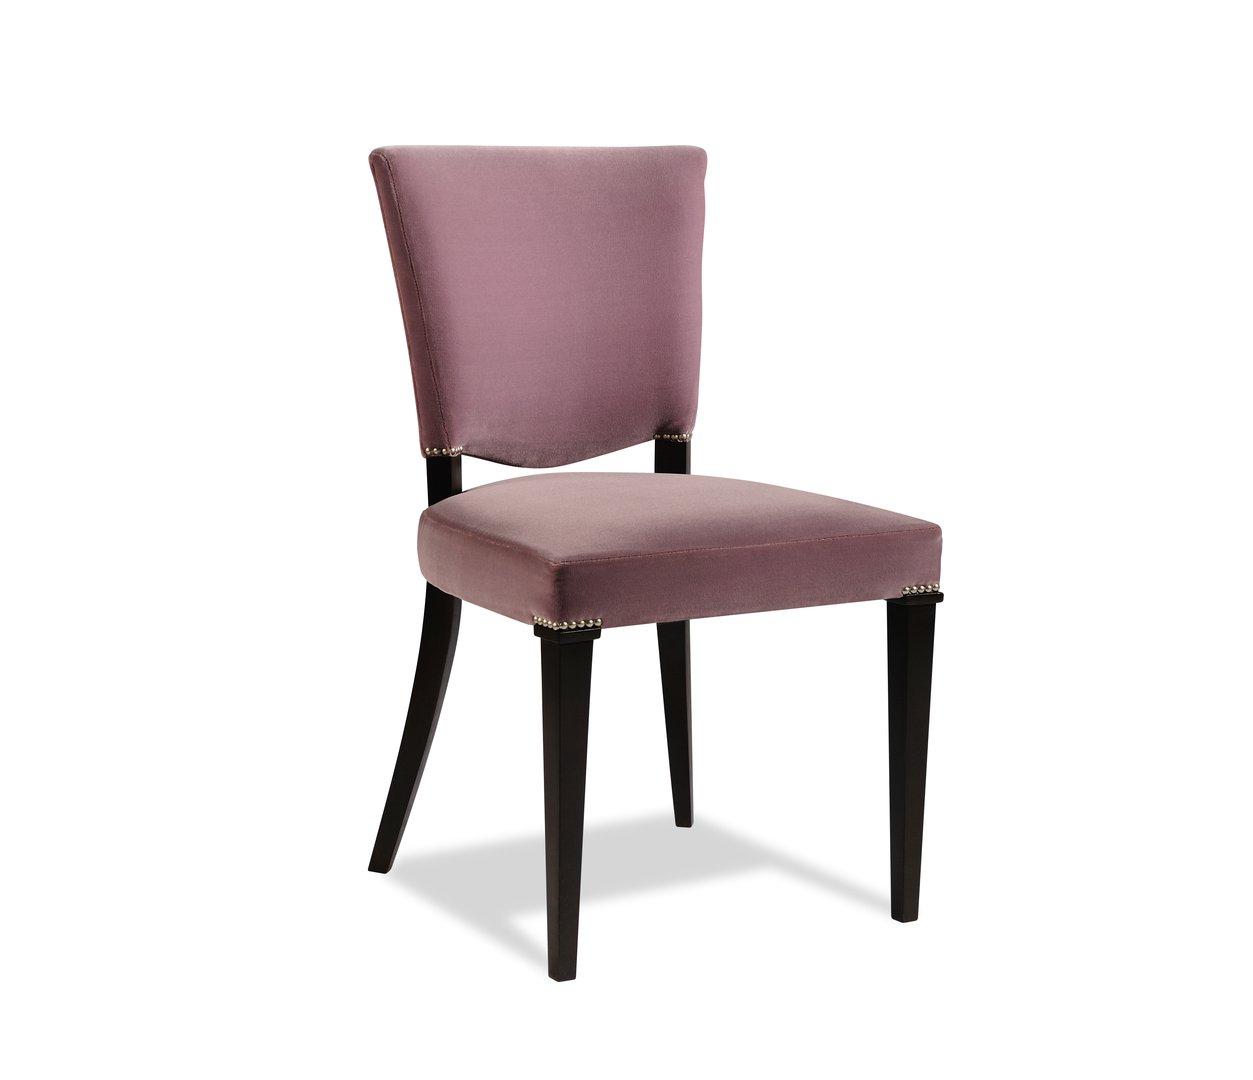 Tia Armless Chair Image